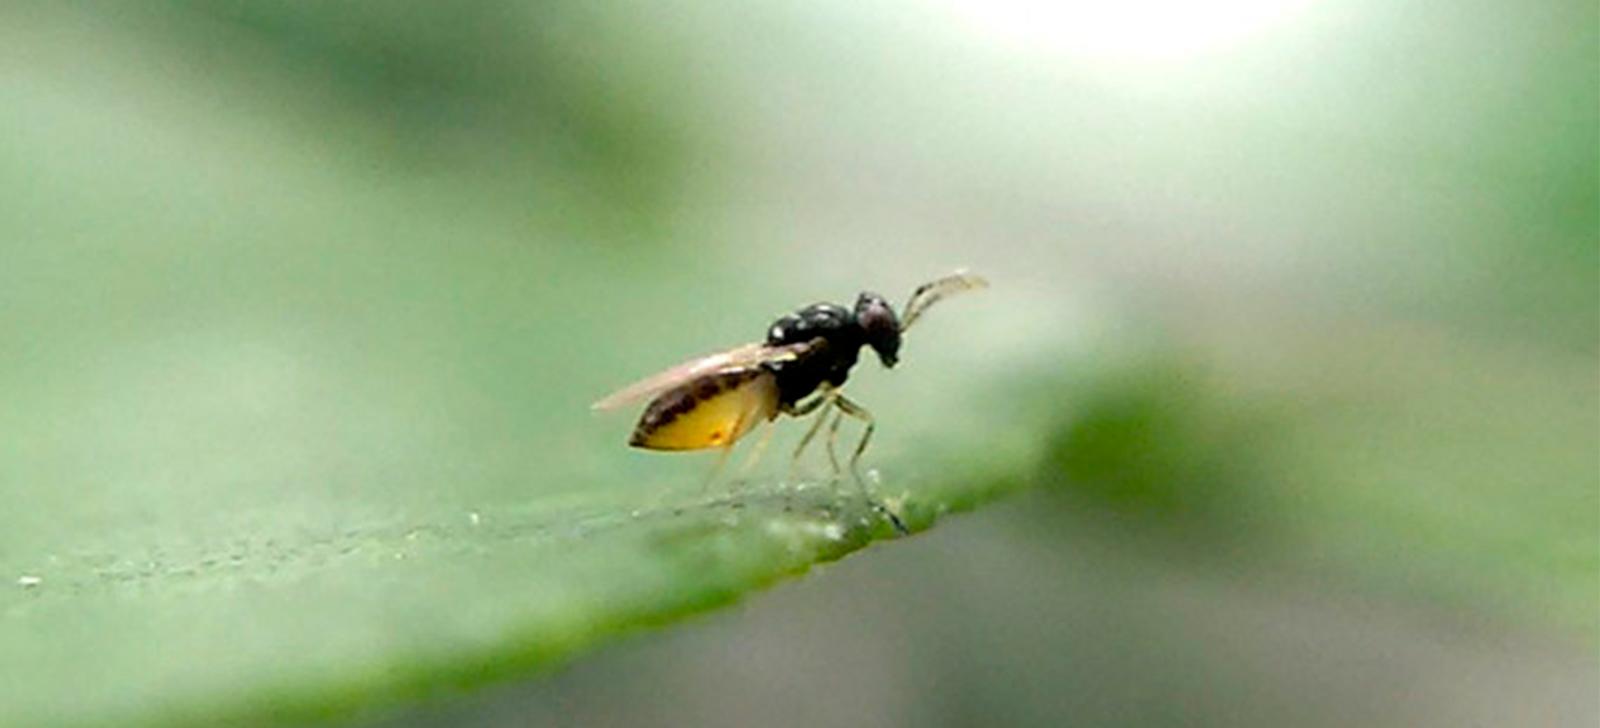 promip manejo integrado de pragas controle biologico blog lapar cooperativas doencas laranjas biologico (4)